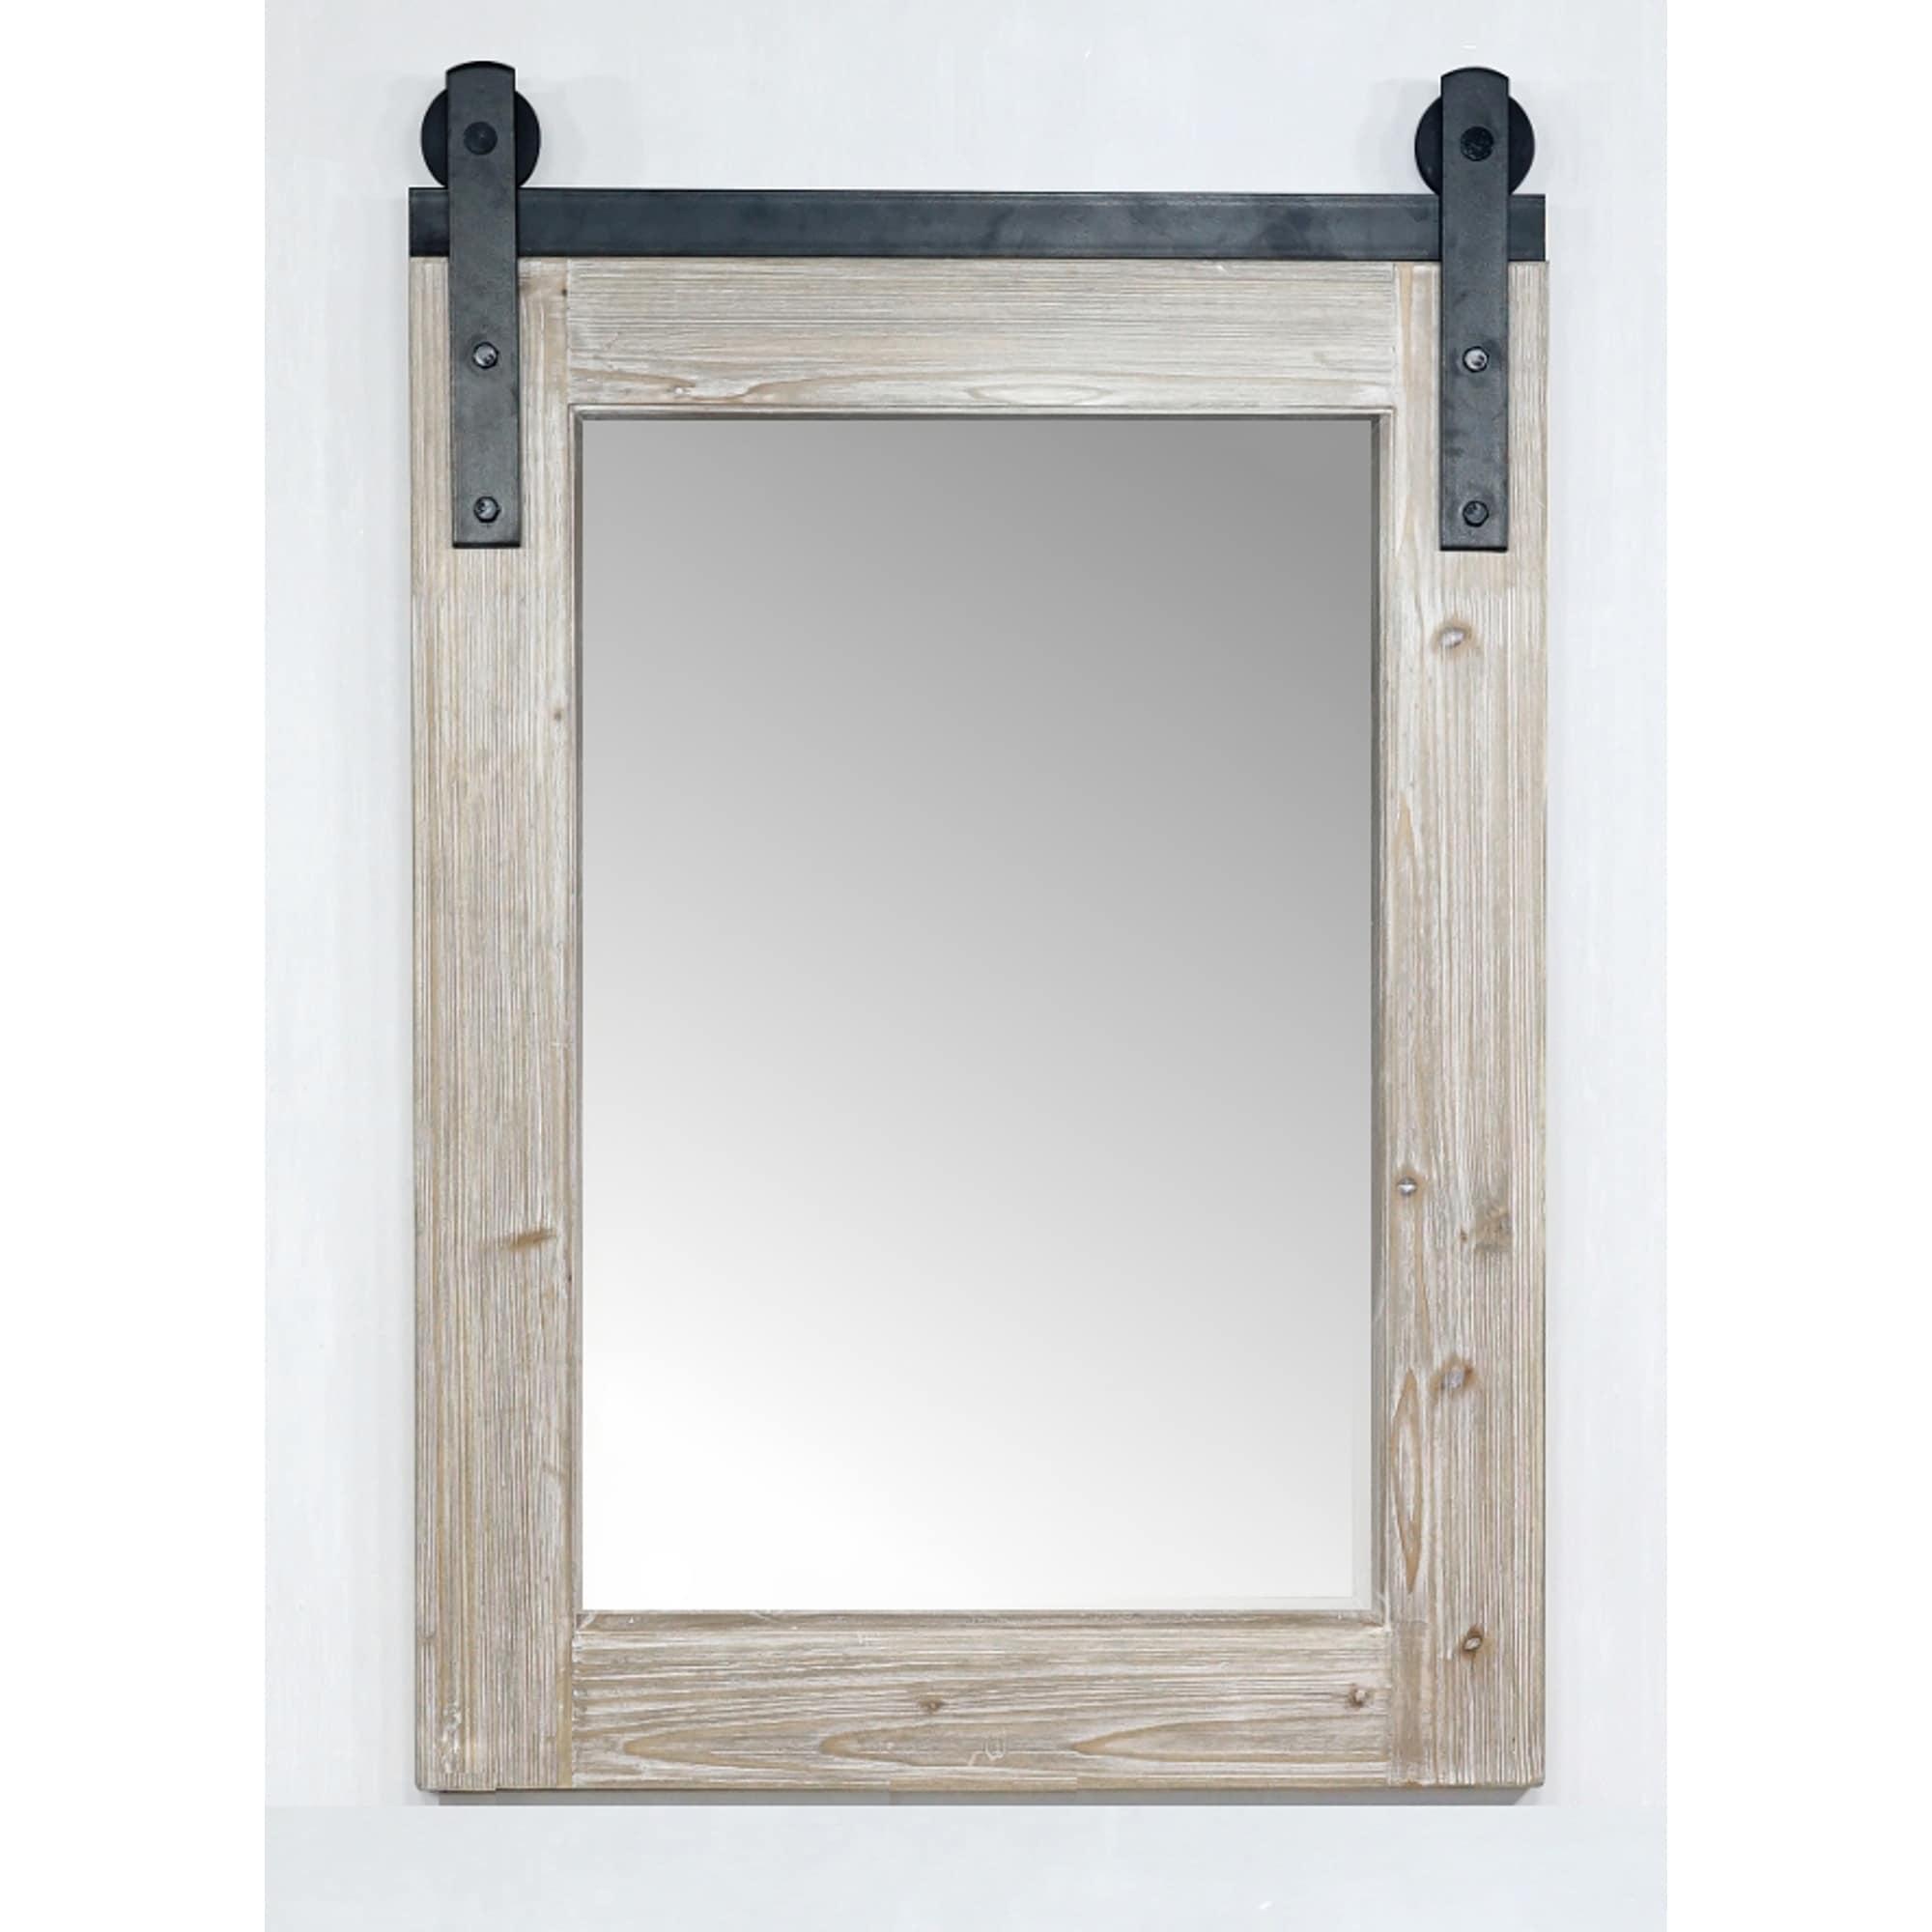 "15"" Rustic Solid Fir Barn Door Style Mirror (15.15"" W x 15"" H)"